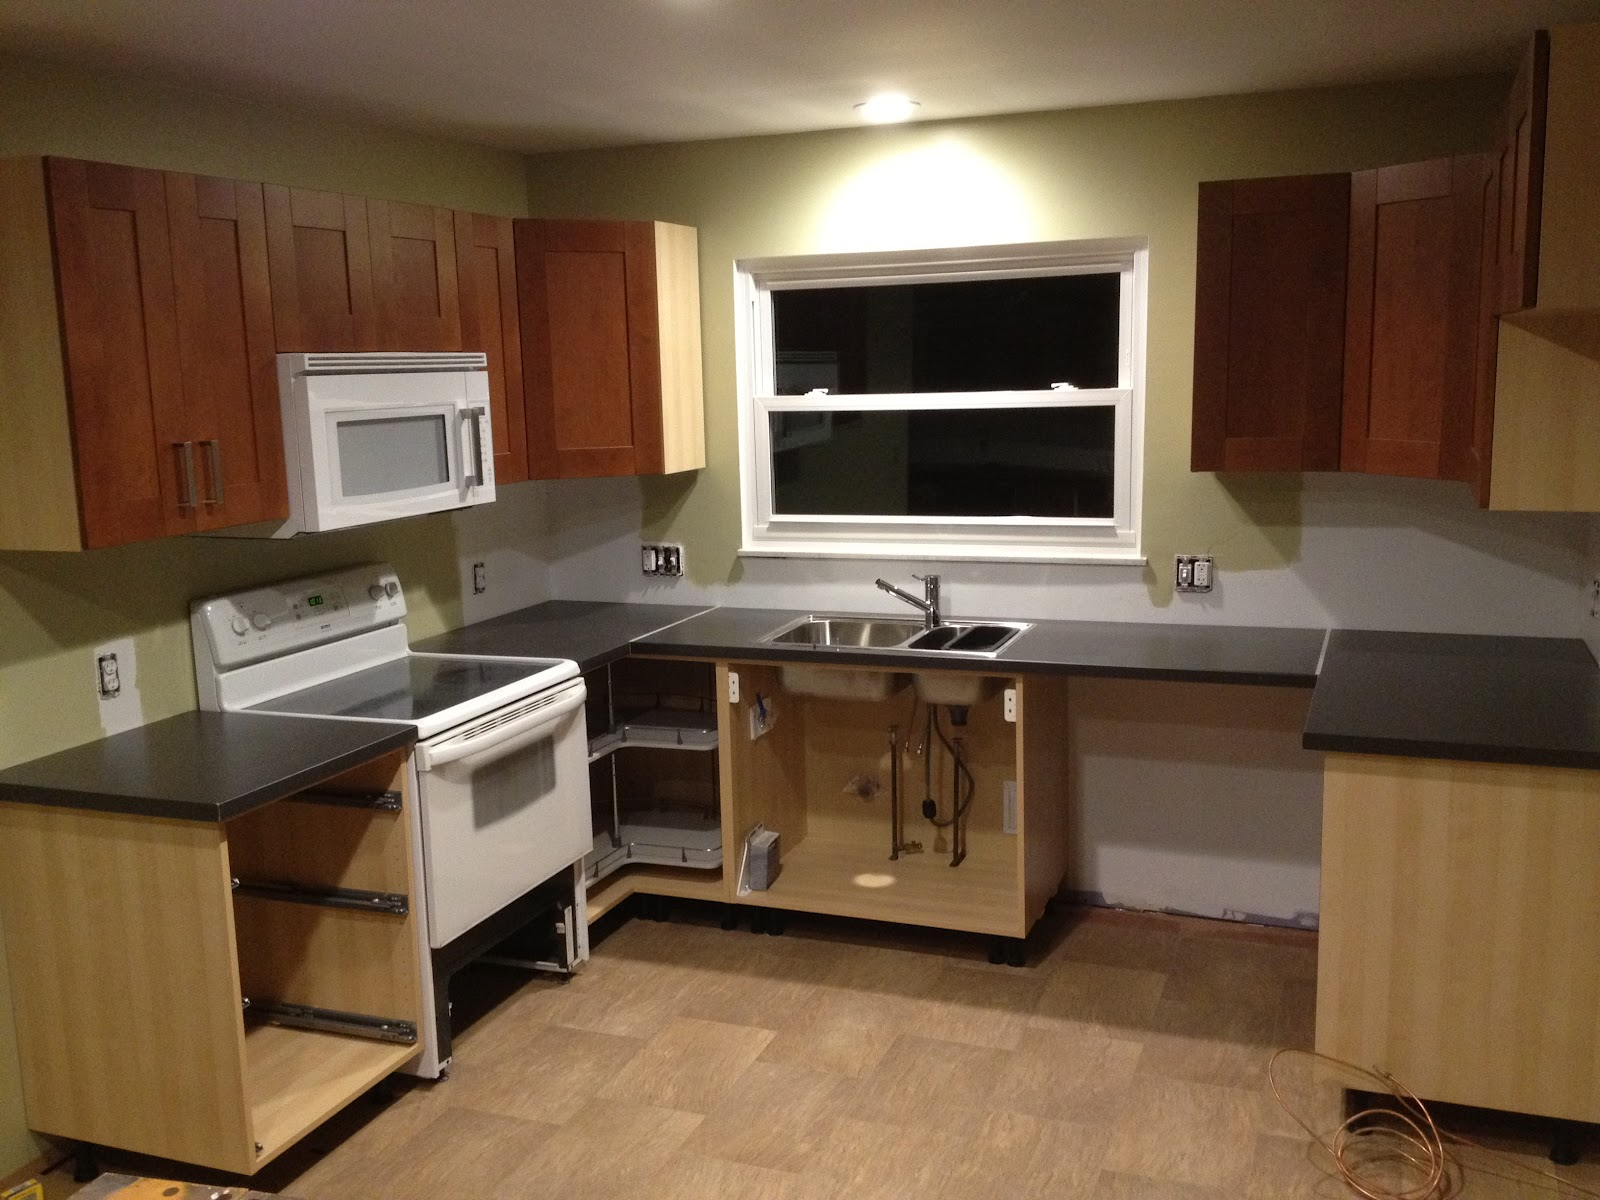 ikea kitchen counters cabinet supplies laminate countertop bstcountertops